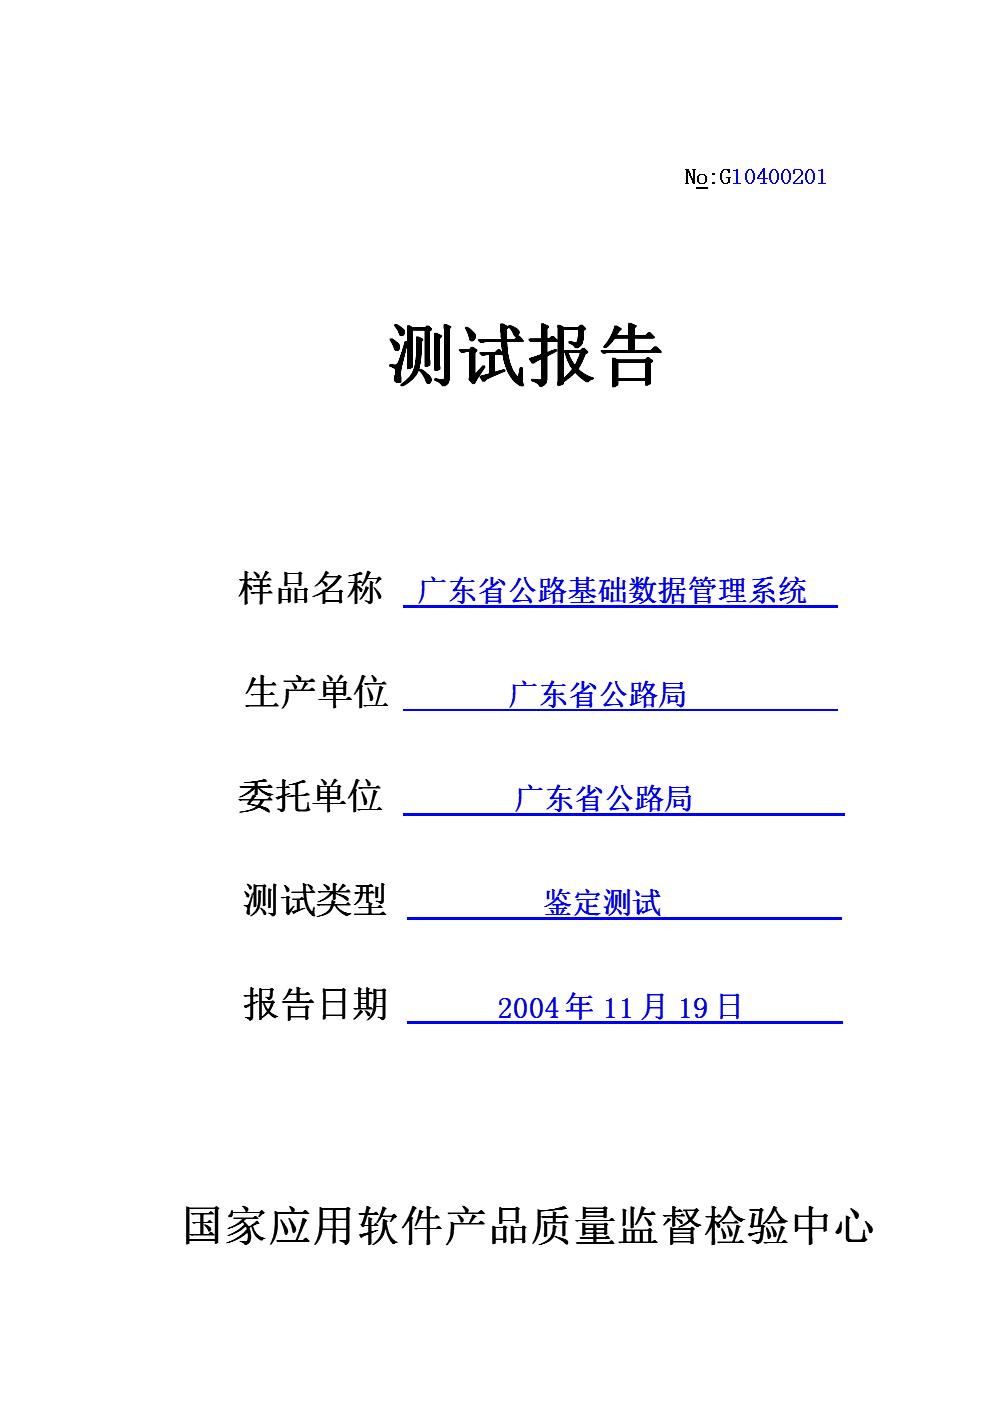 JW06M11鉴定测试报告模板.doc